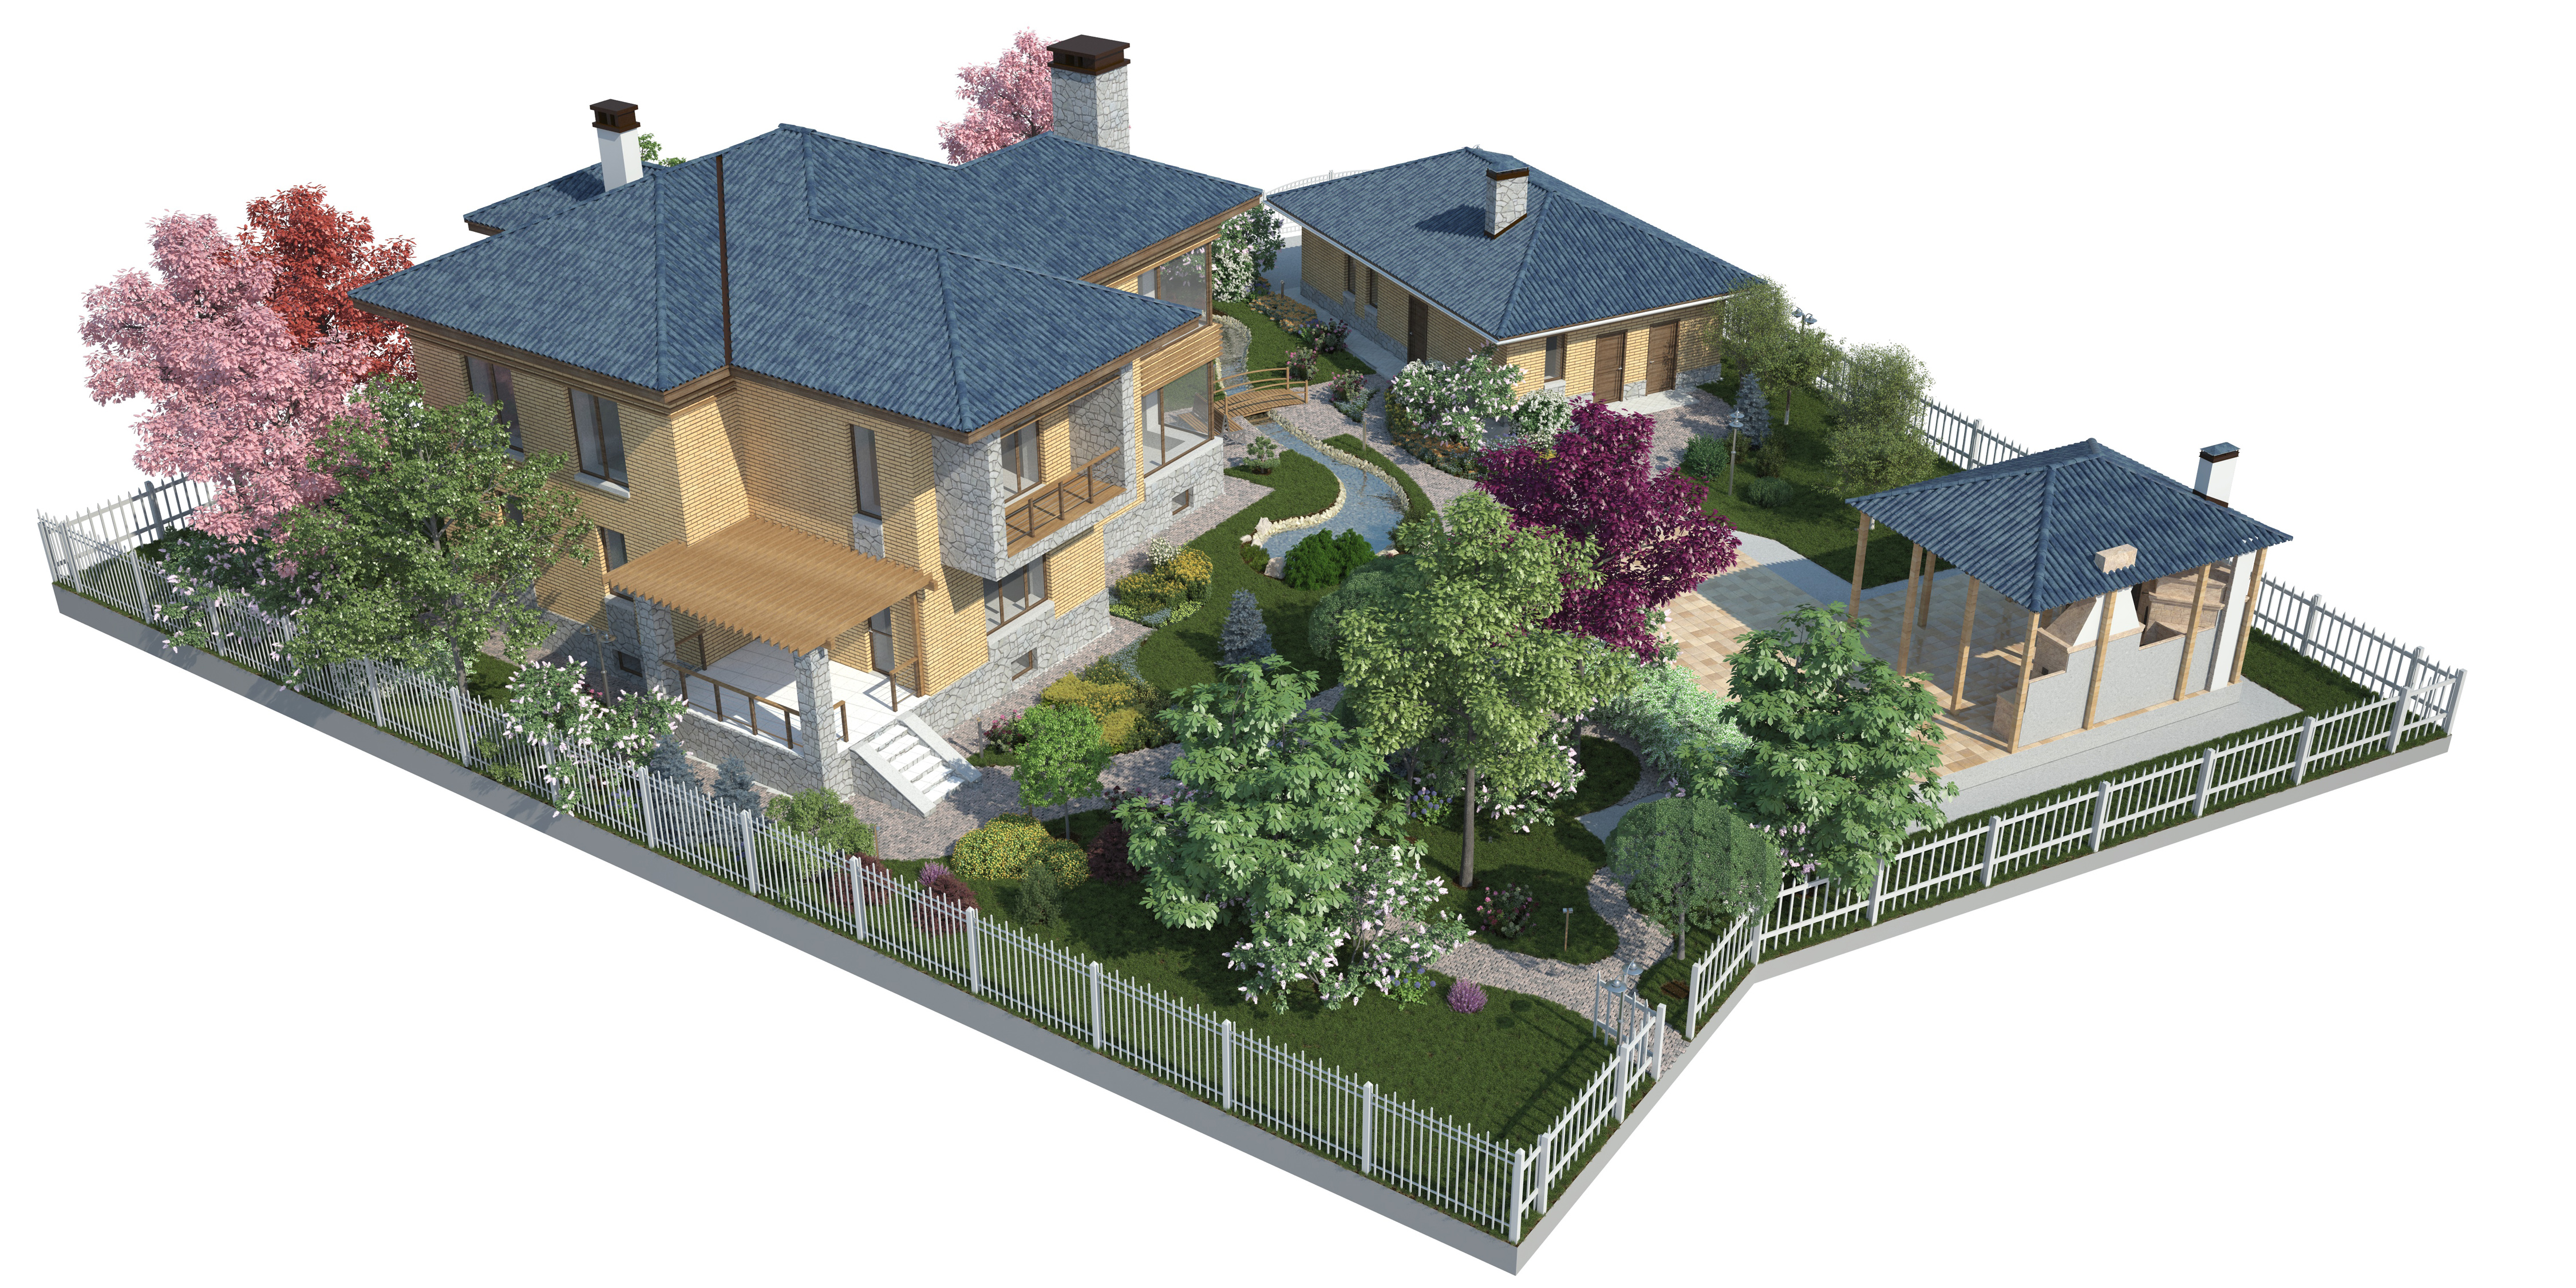 The backyard garden visualization n2 by i t h i l on for Garden design visualiser